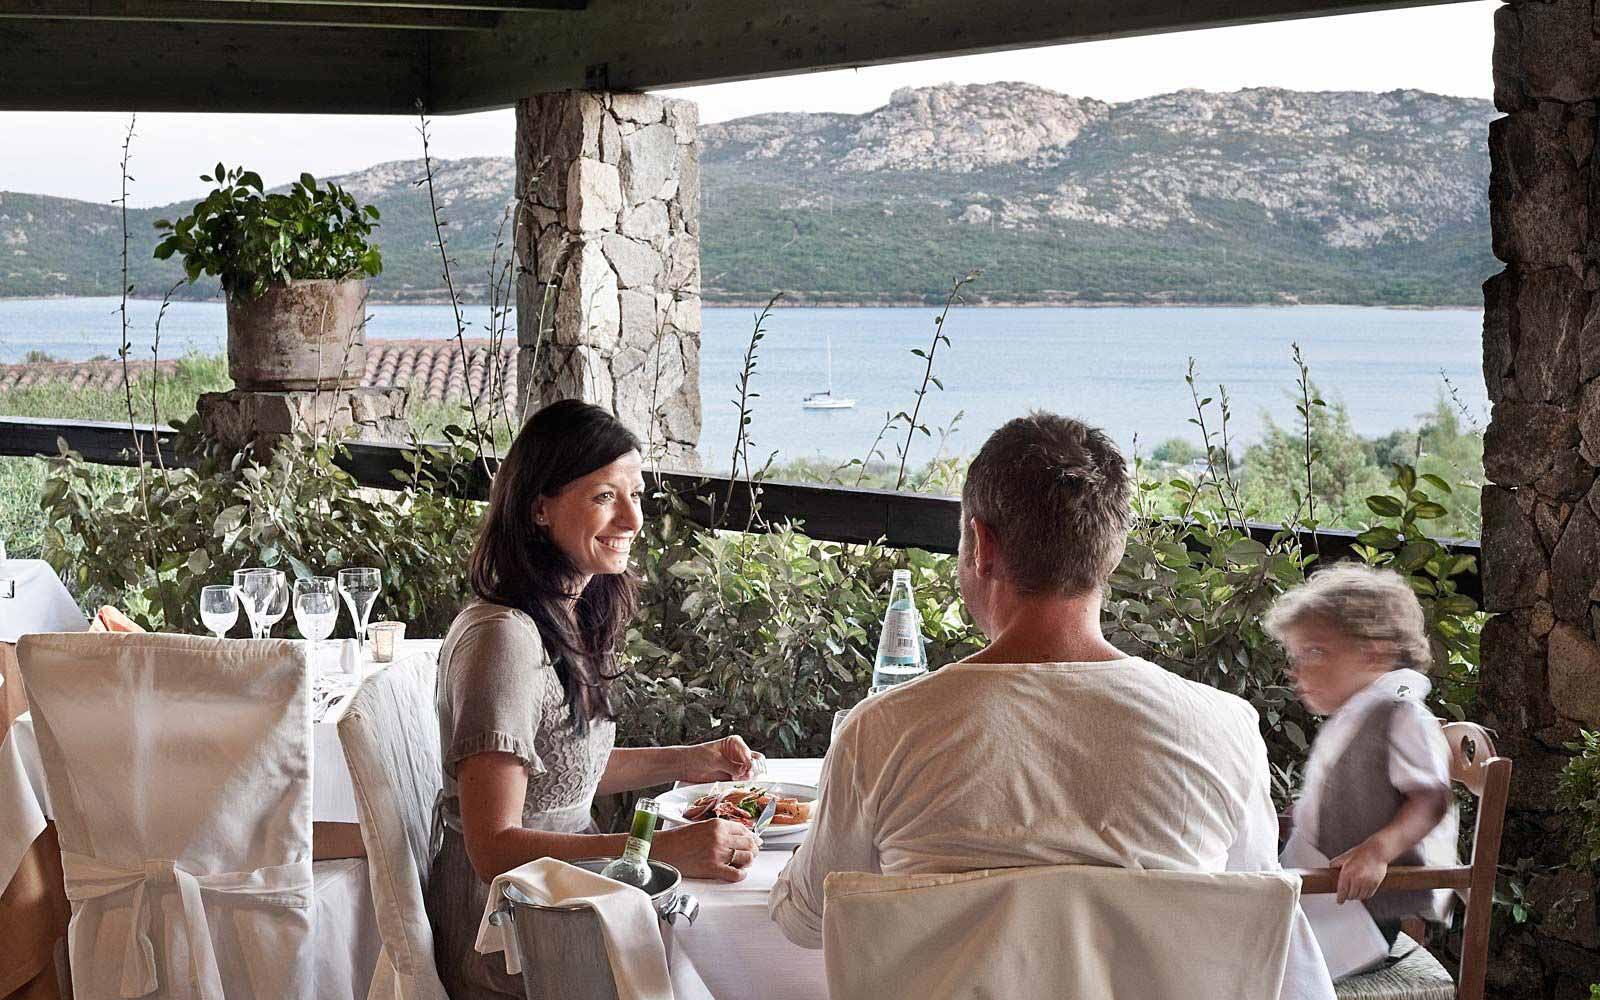 Le Terrazze restaurant at Park Hotel & Spa Cala di Lepre